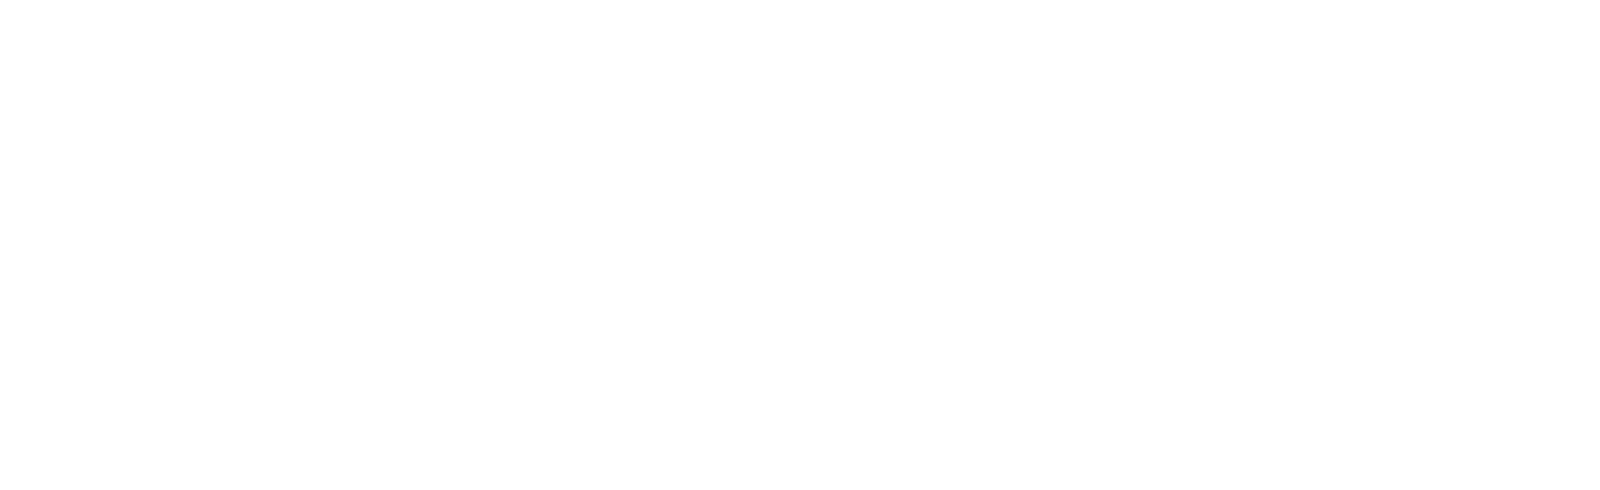 02citus